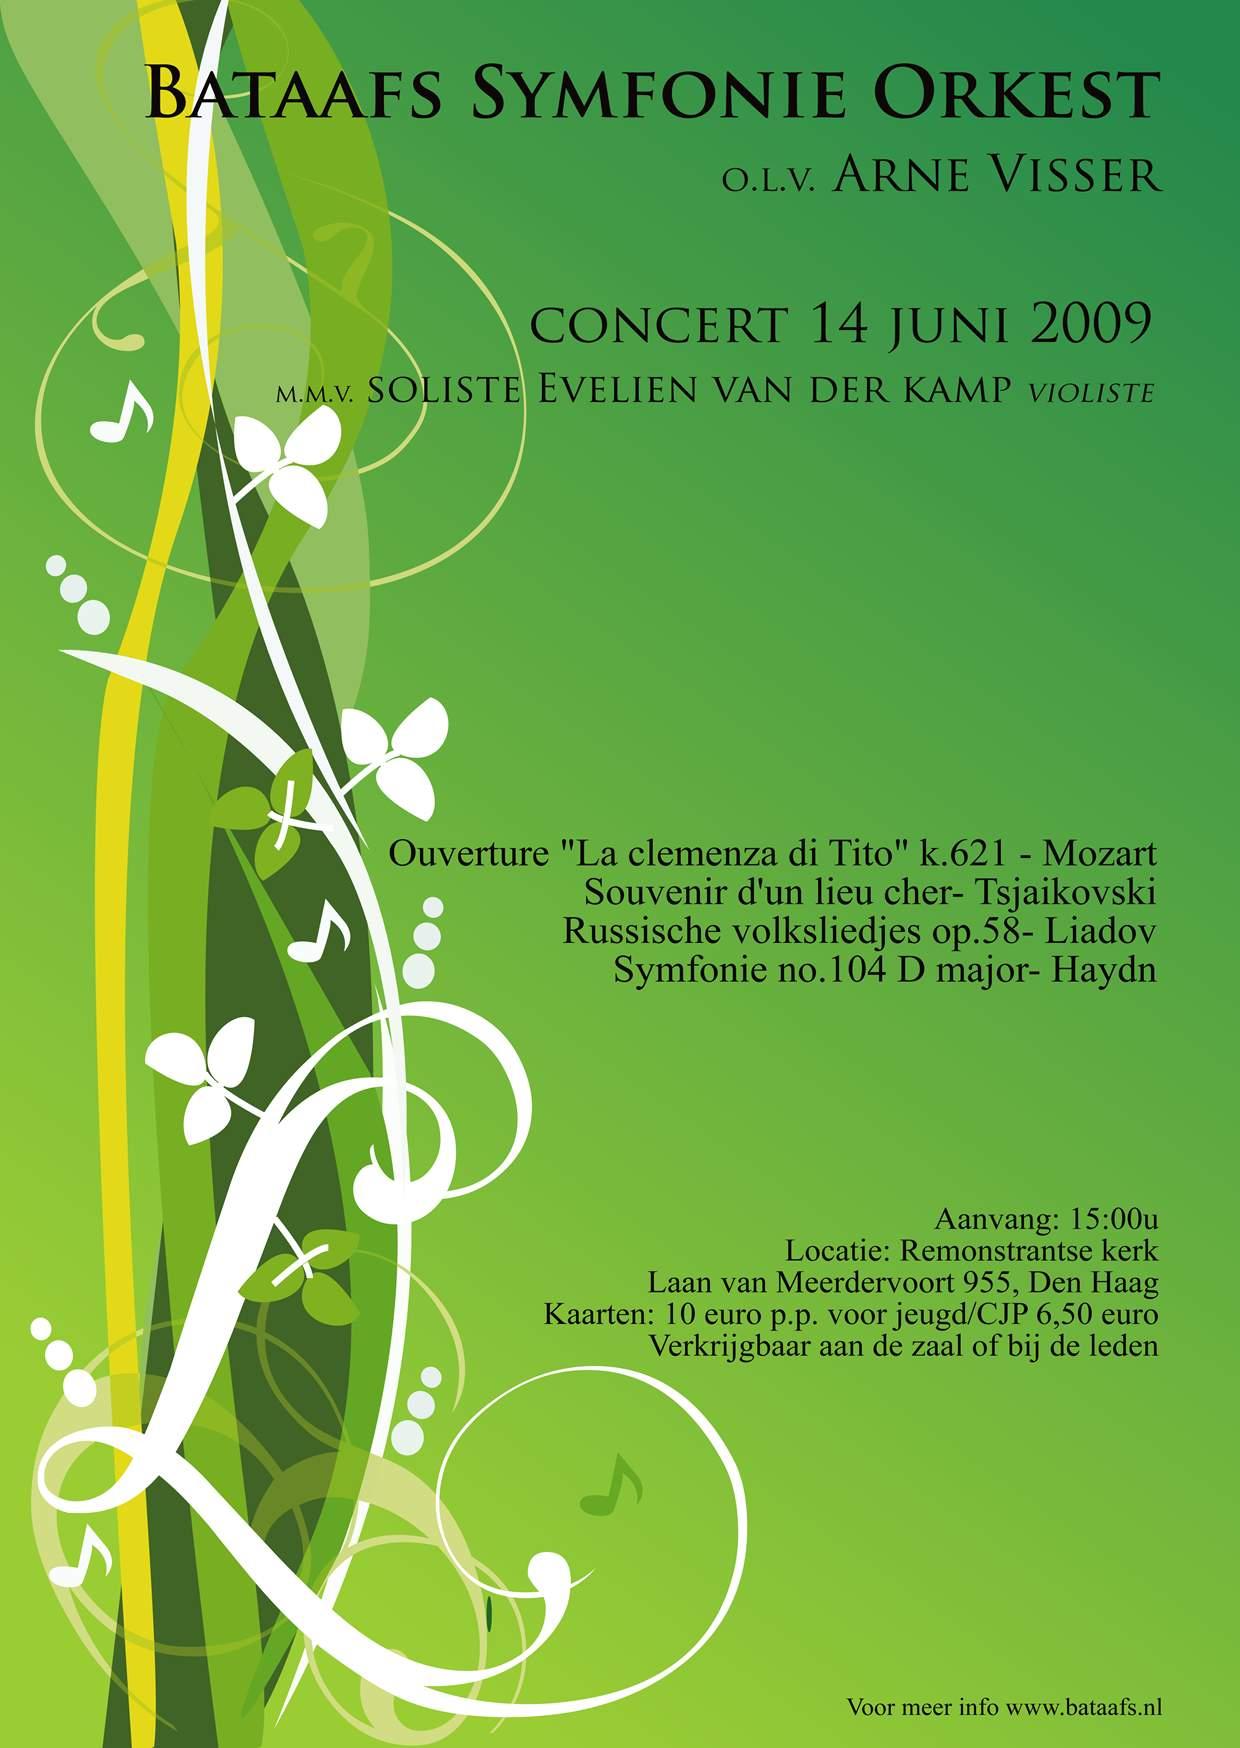 poster concert 2009.1